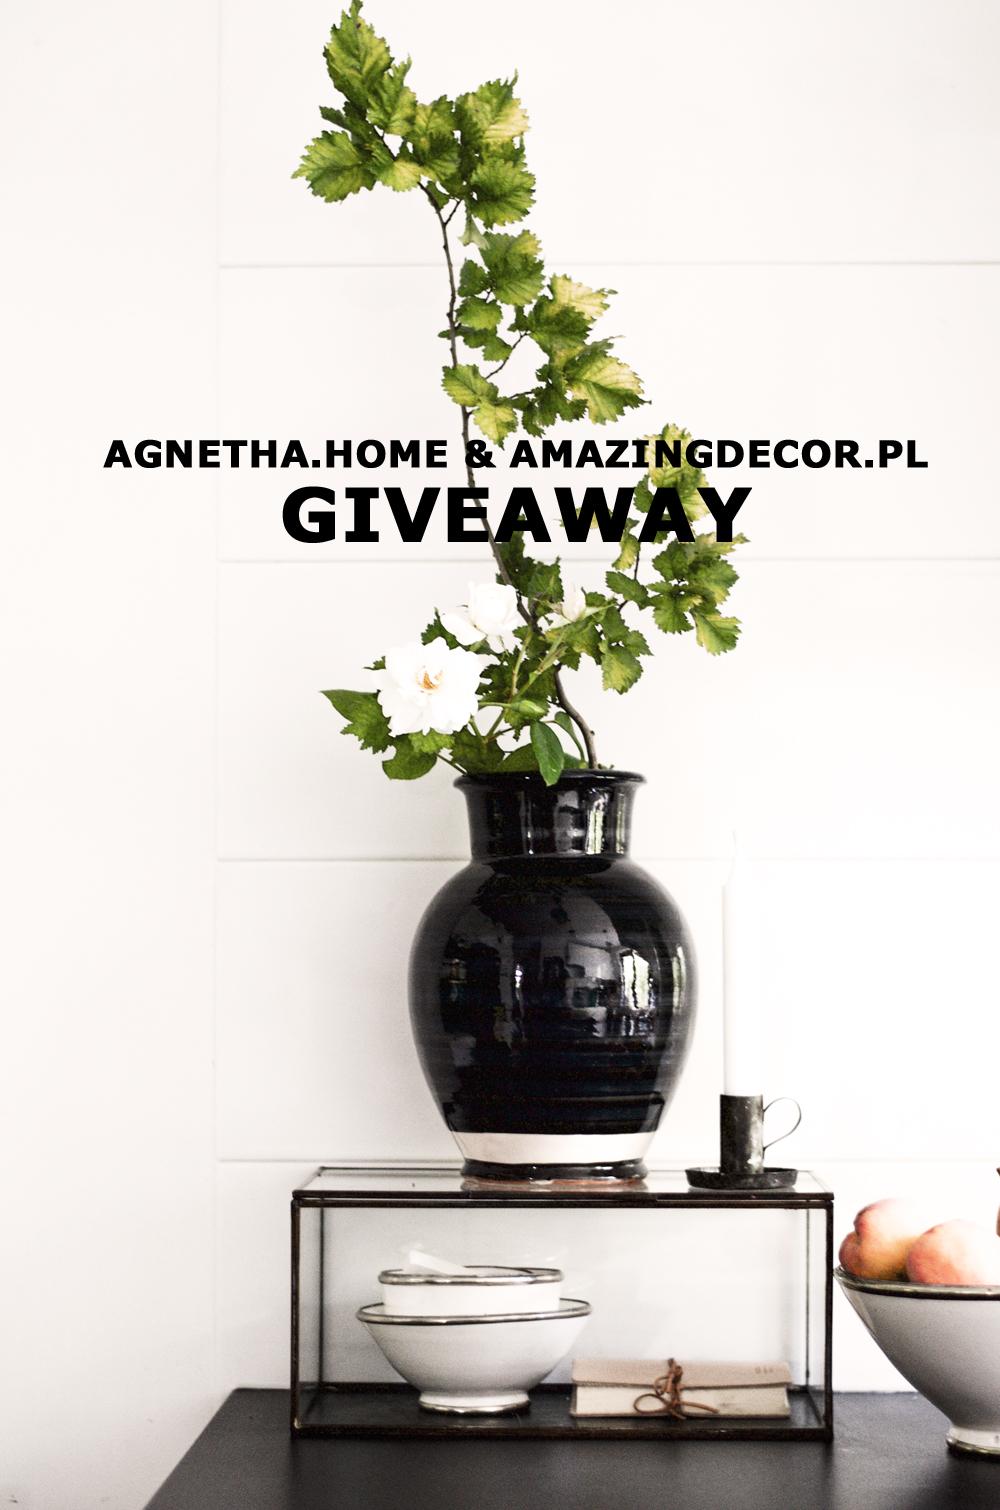 kOnkurs Agnetha home